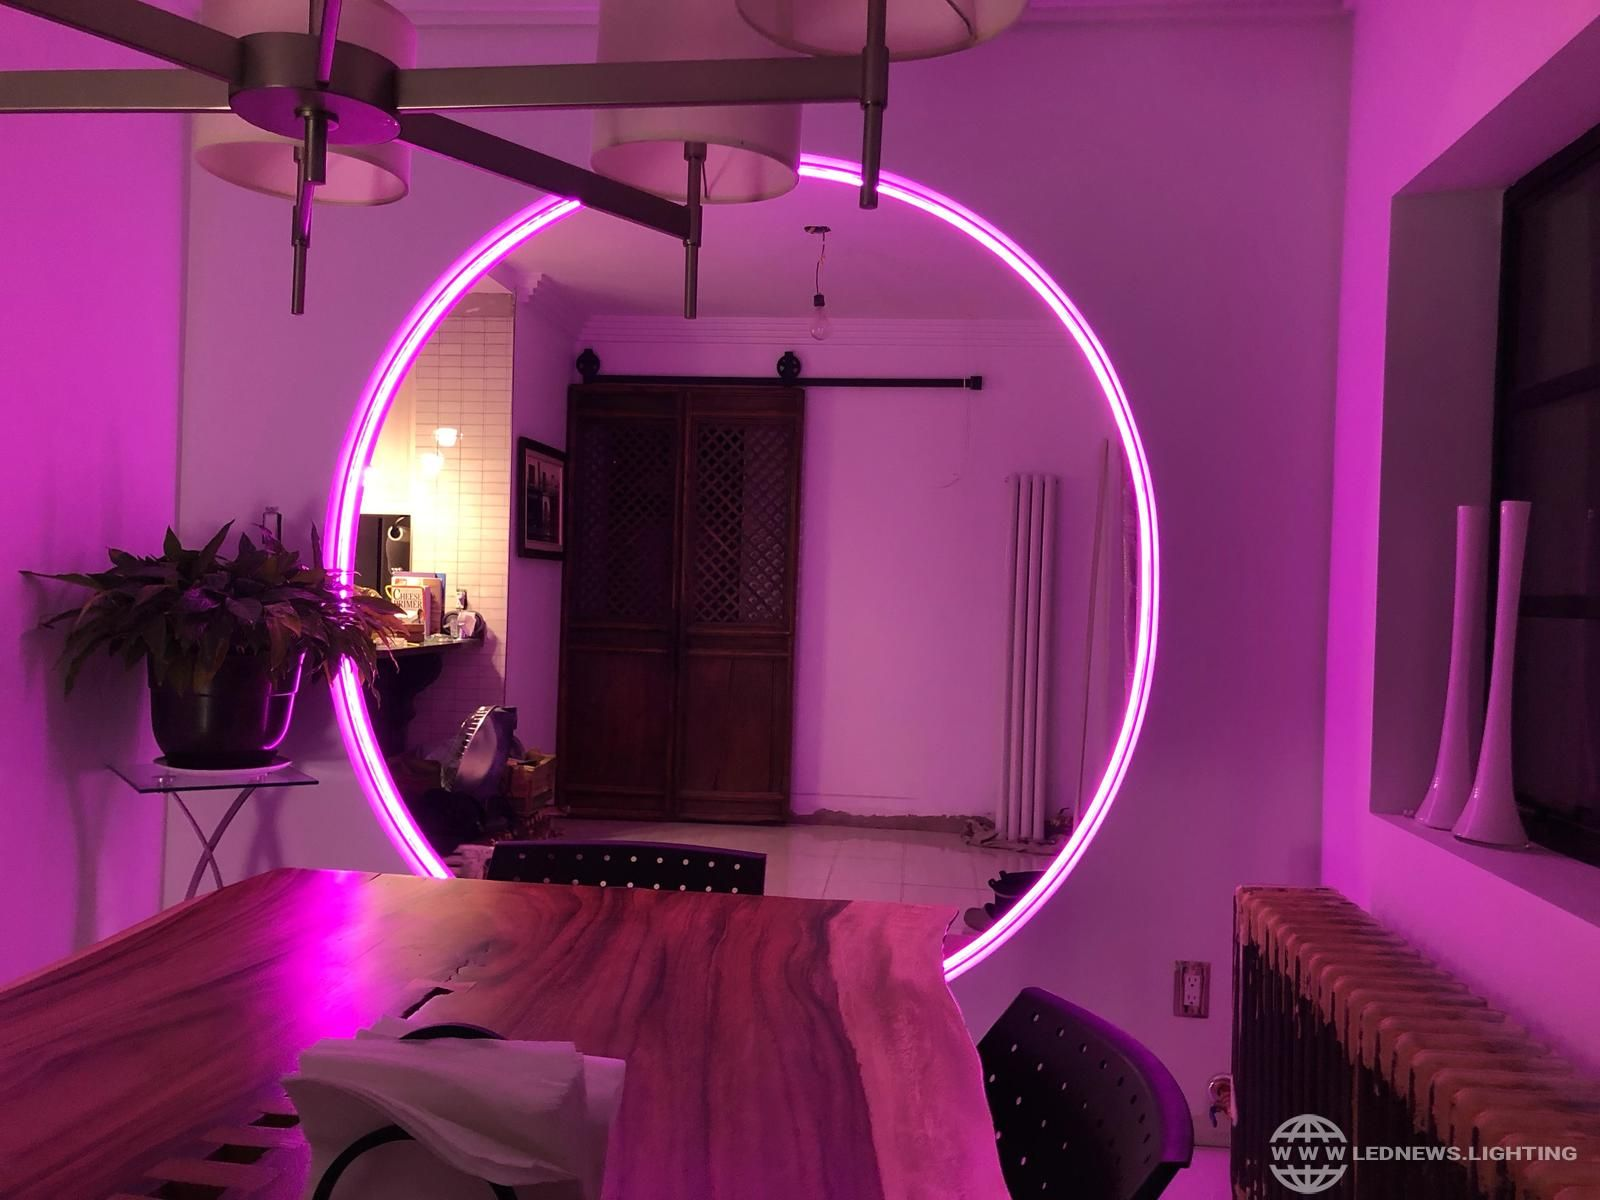 1 10m Outdoor Indoor Led Beleuchtung Flex Led Neon Licht Smd Led Streifen Seil Licht Wasserdichte In 2020 Led Light Design Led Lights Modern Led Lighting